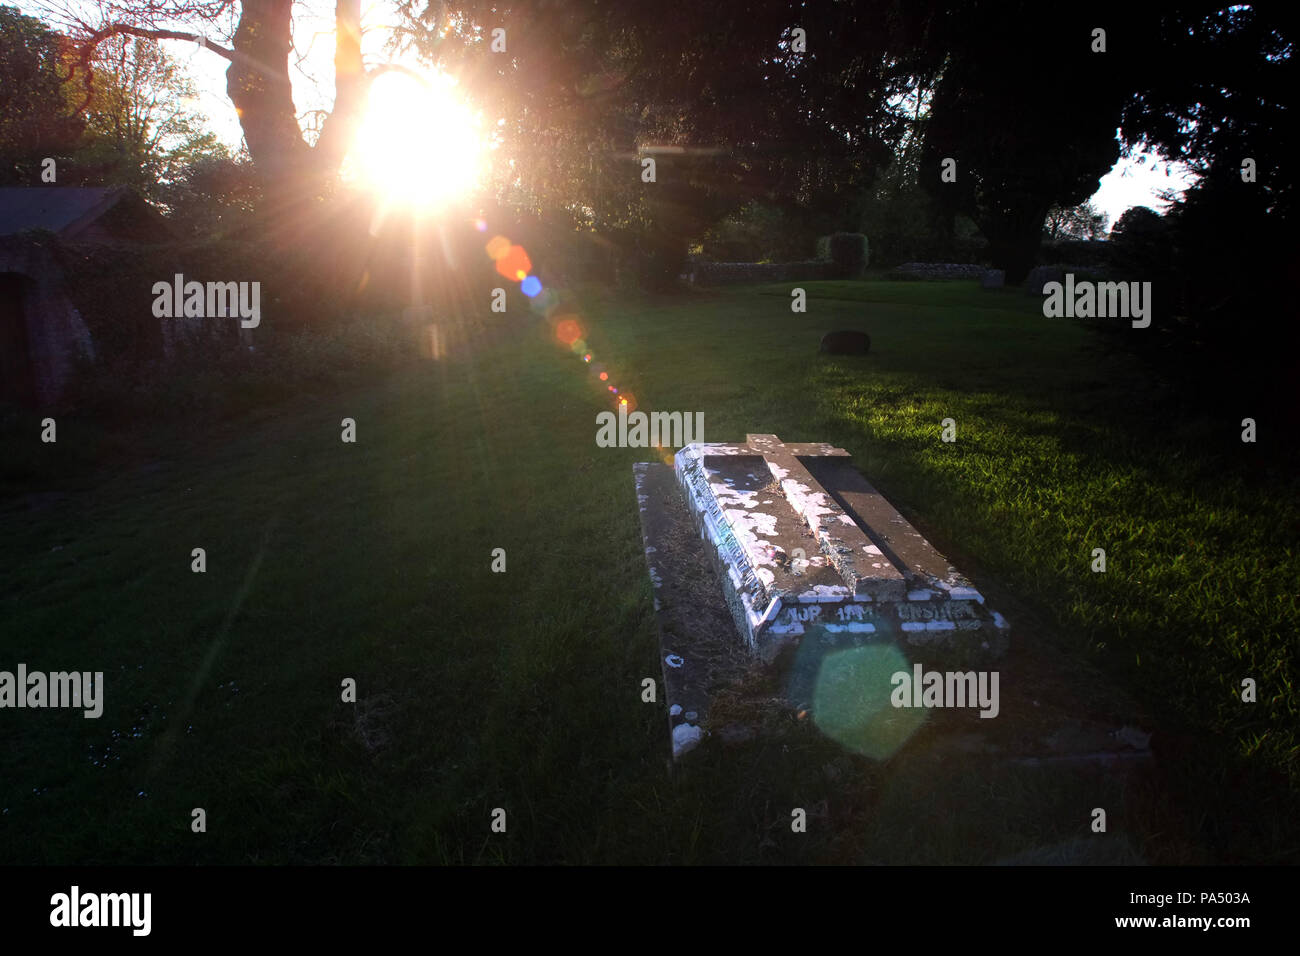 Sunbeam illuminating a grave in a parish churchyard. - Stock Image